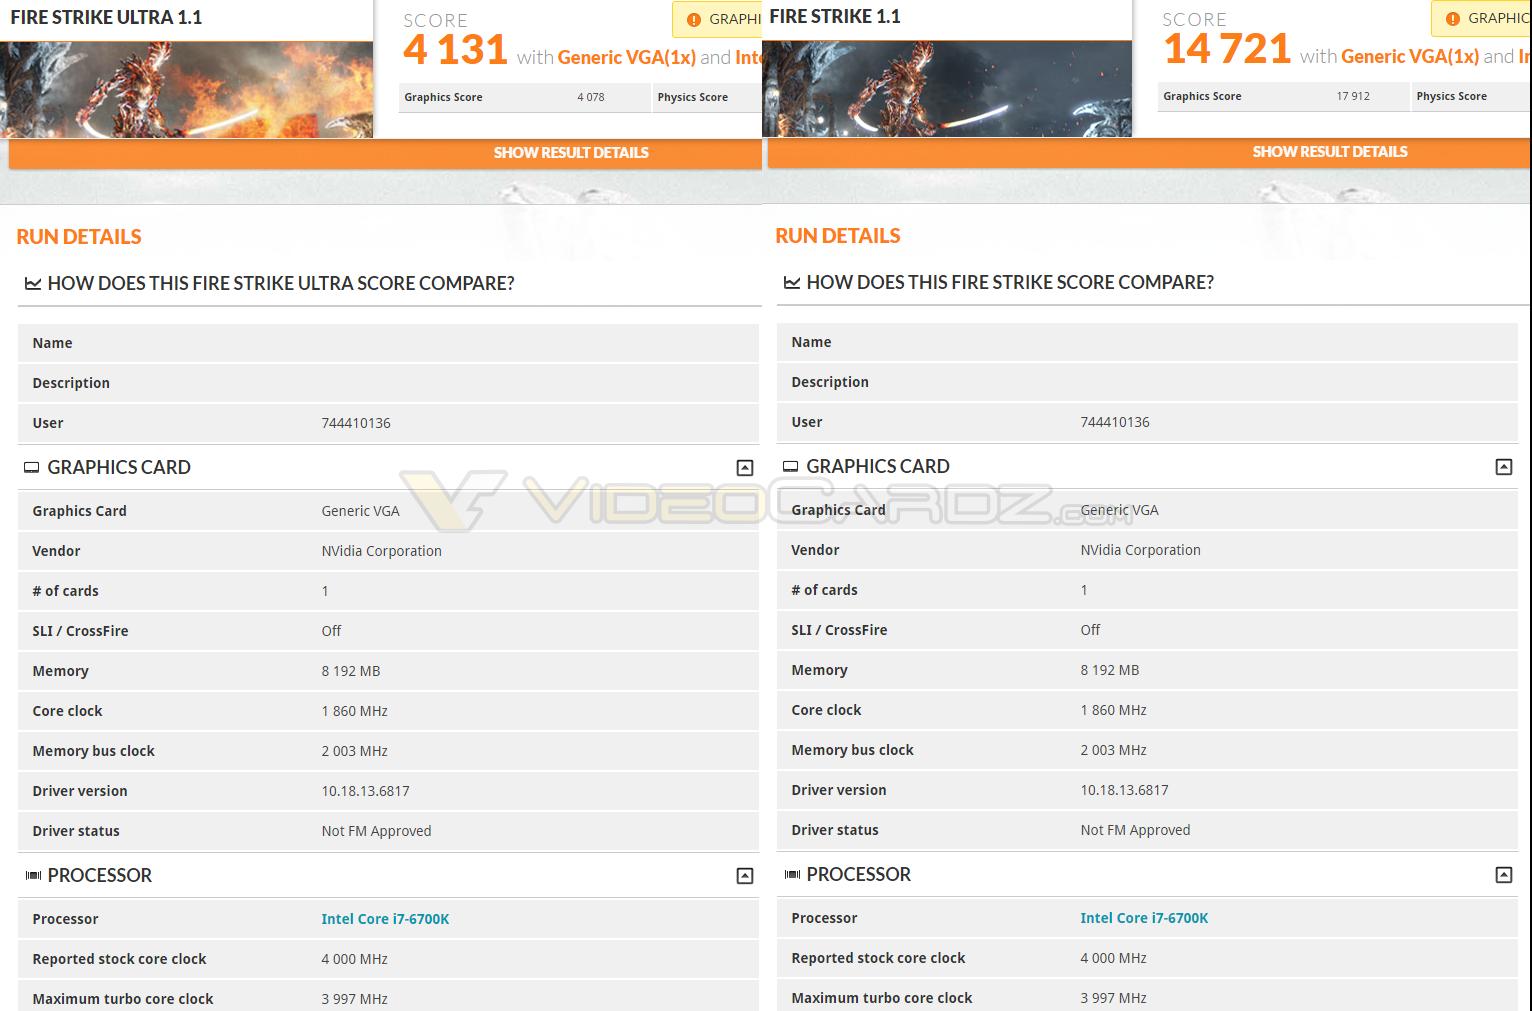 NVIDIA GeForce GTX 1070 3DMark FireStrike benchmarks